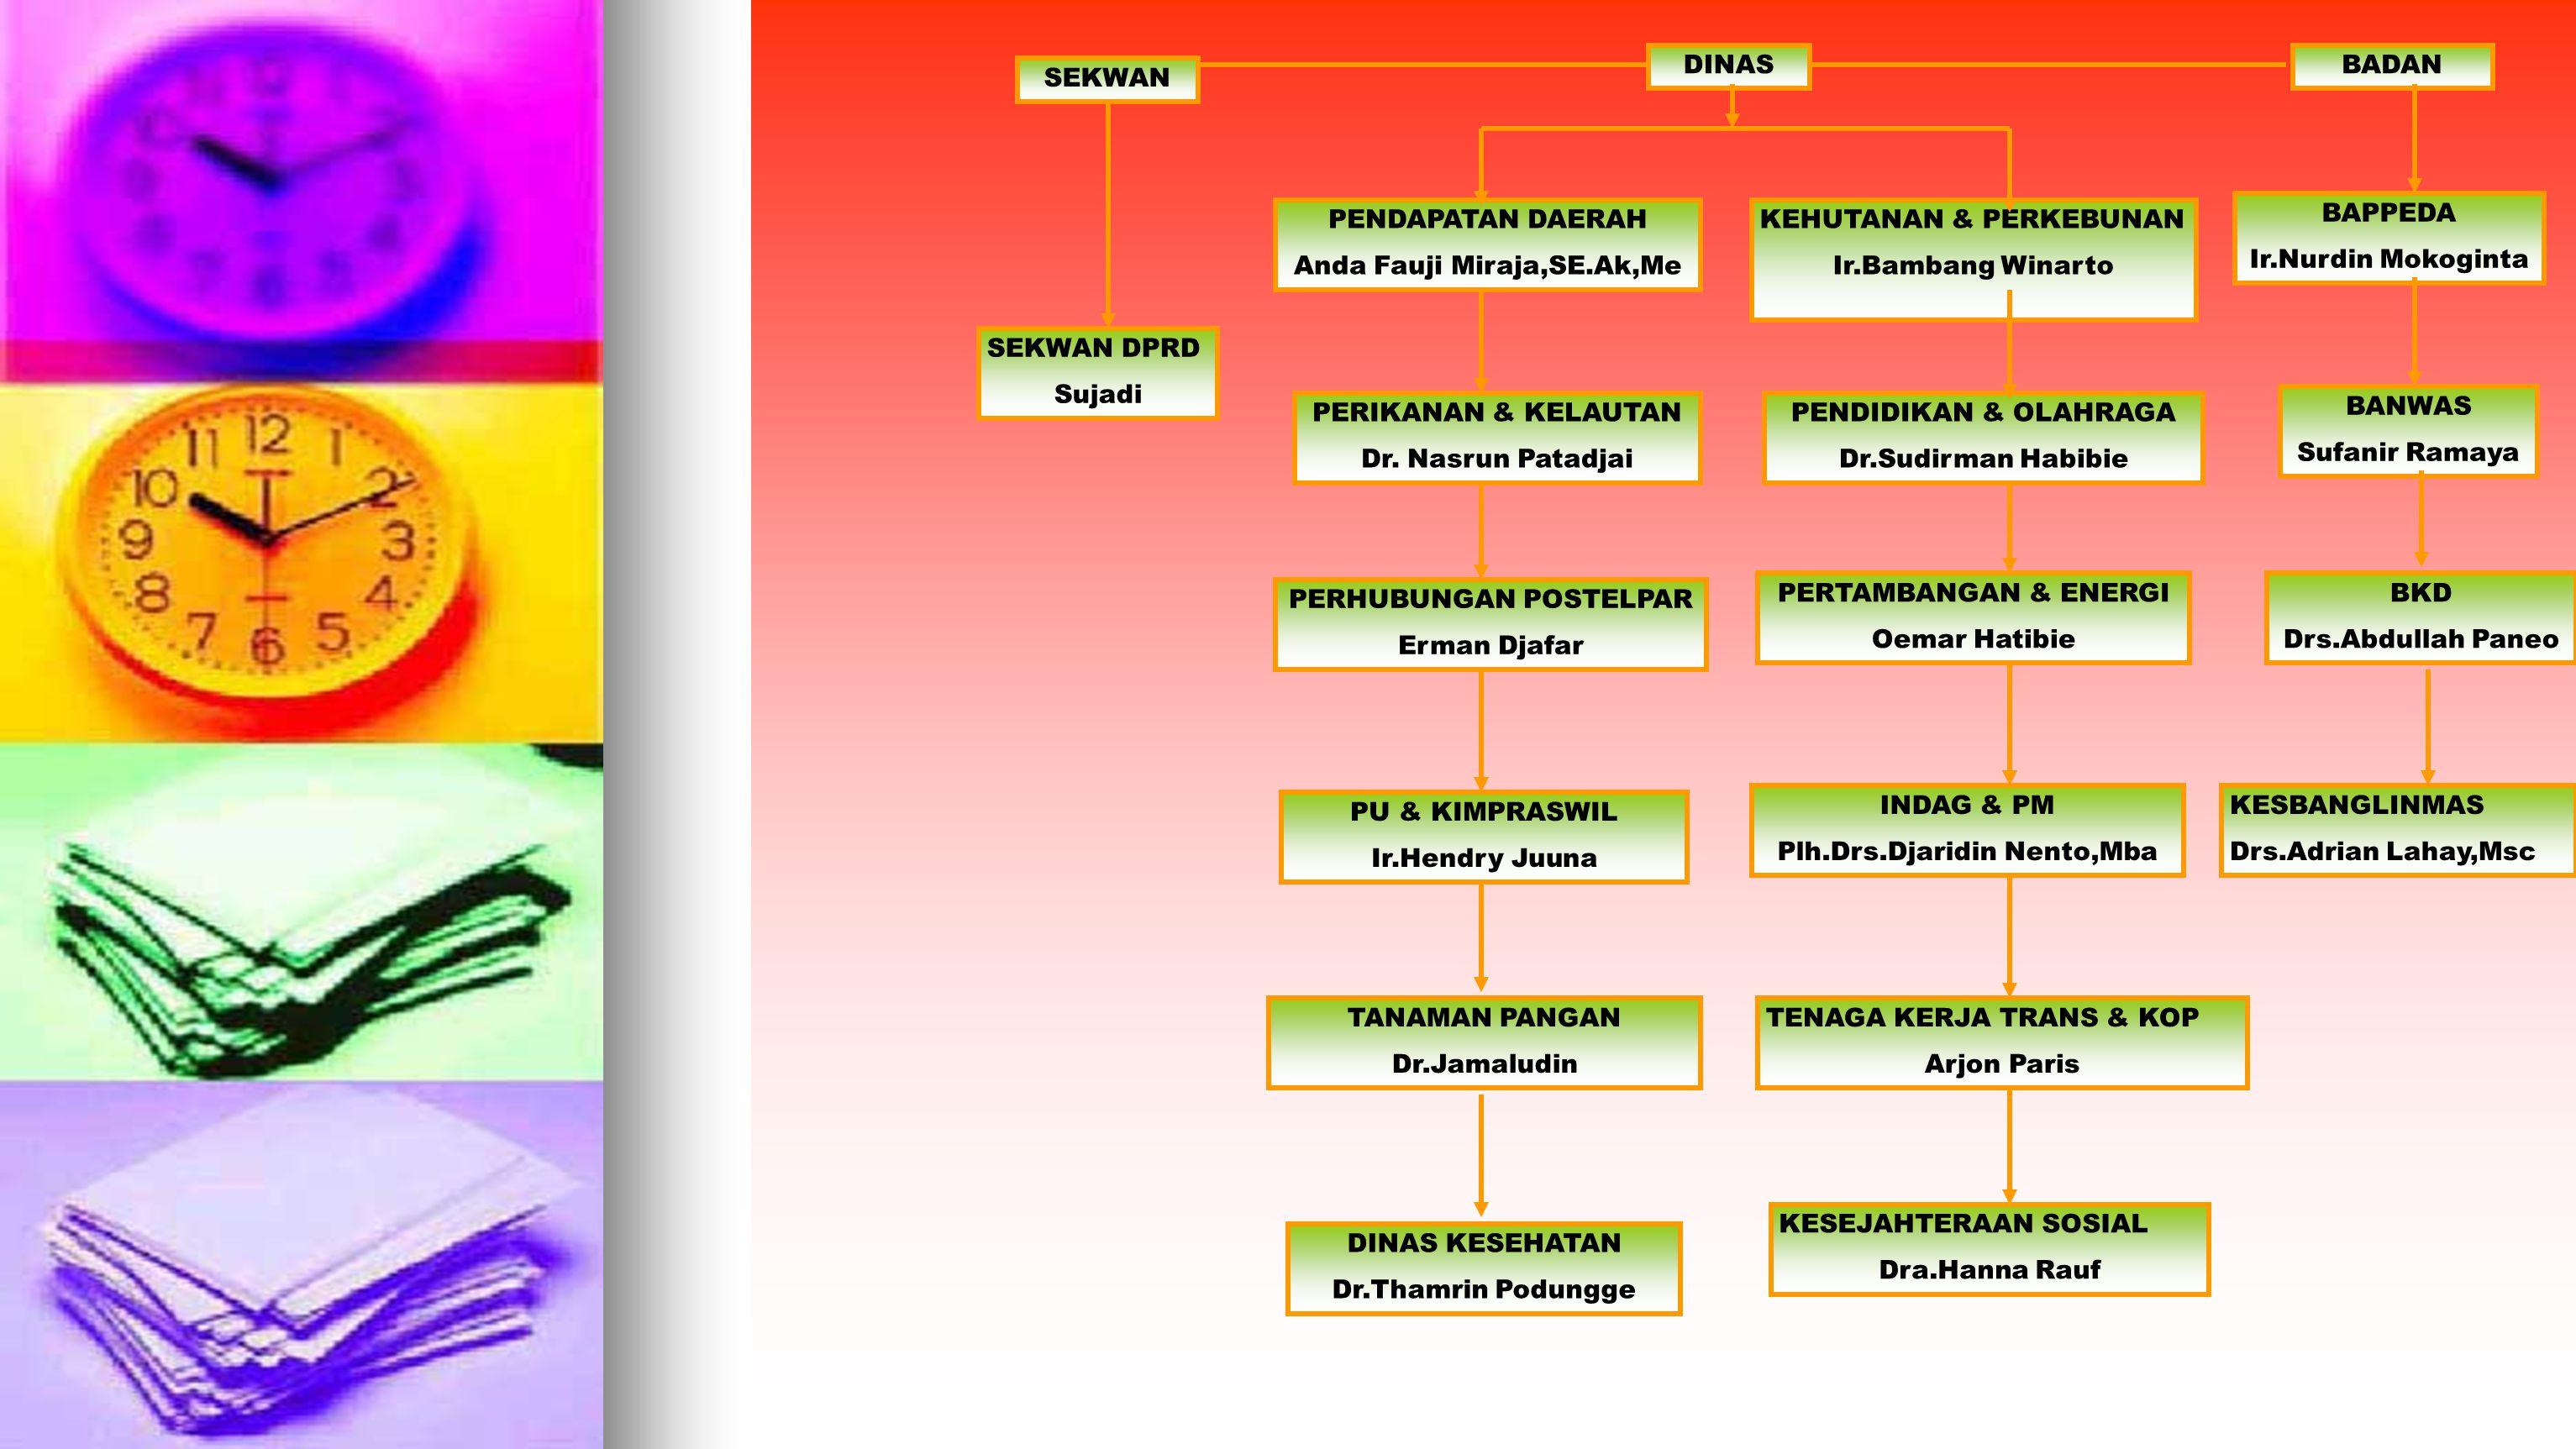 STRUKTUR PEMERINTAH PROVINSI GORONTALO GUBERNUR Ir.Fadel Muhammad Asisten 2 Bonie Oitoe Asisten 3 Drs.